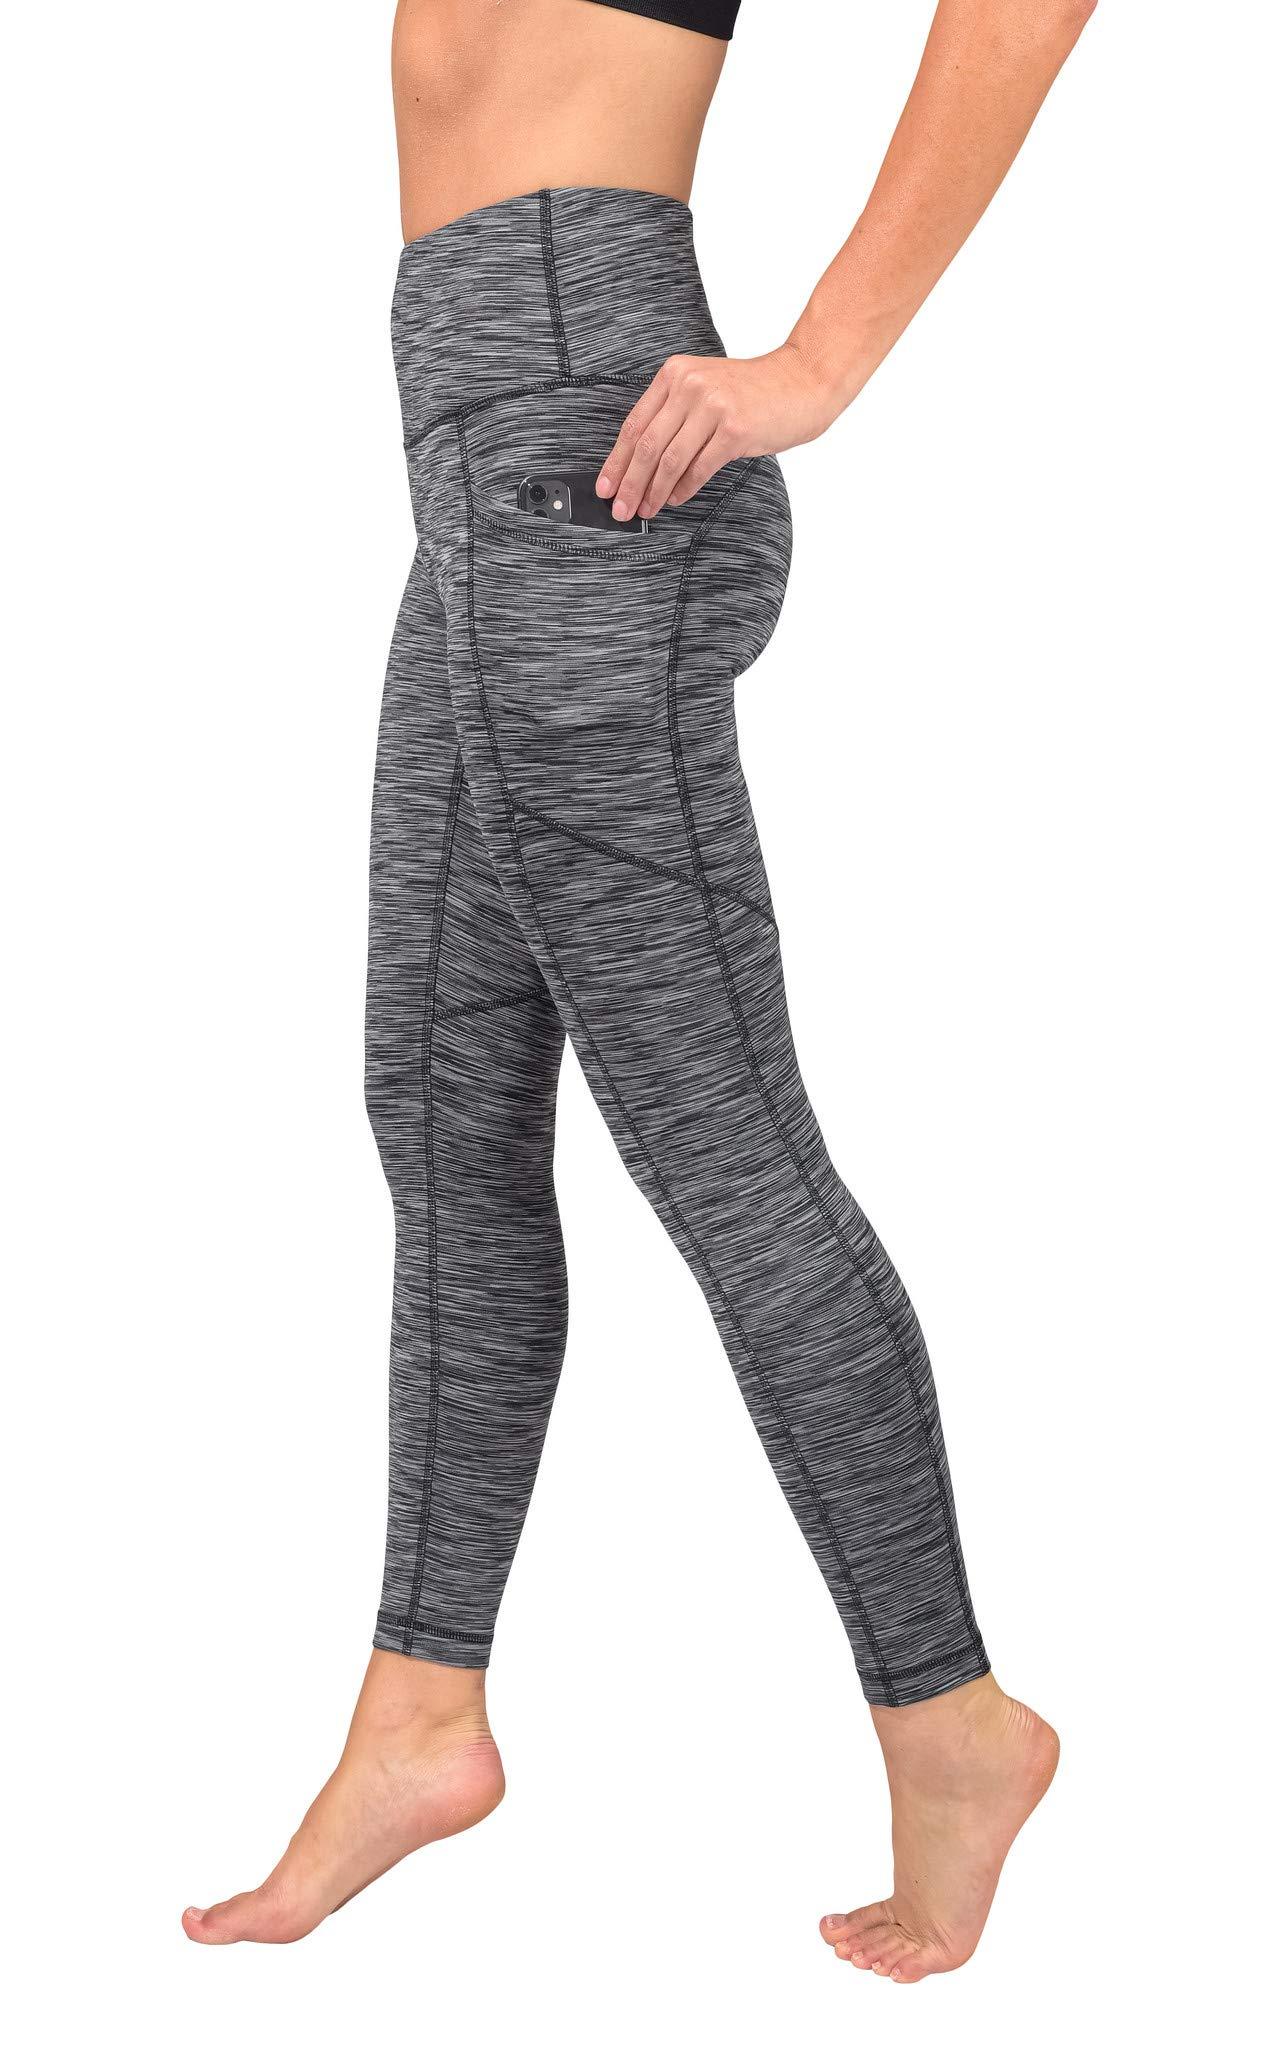 GEVJON High Waist Yoga Pants 2 Pockets Tummy Control Leggings Workout Tights